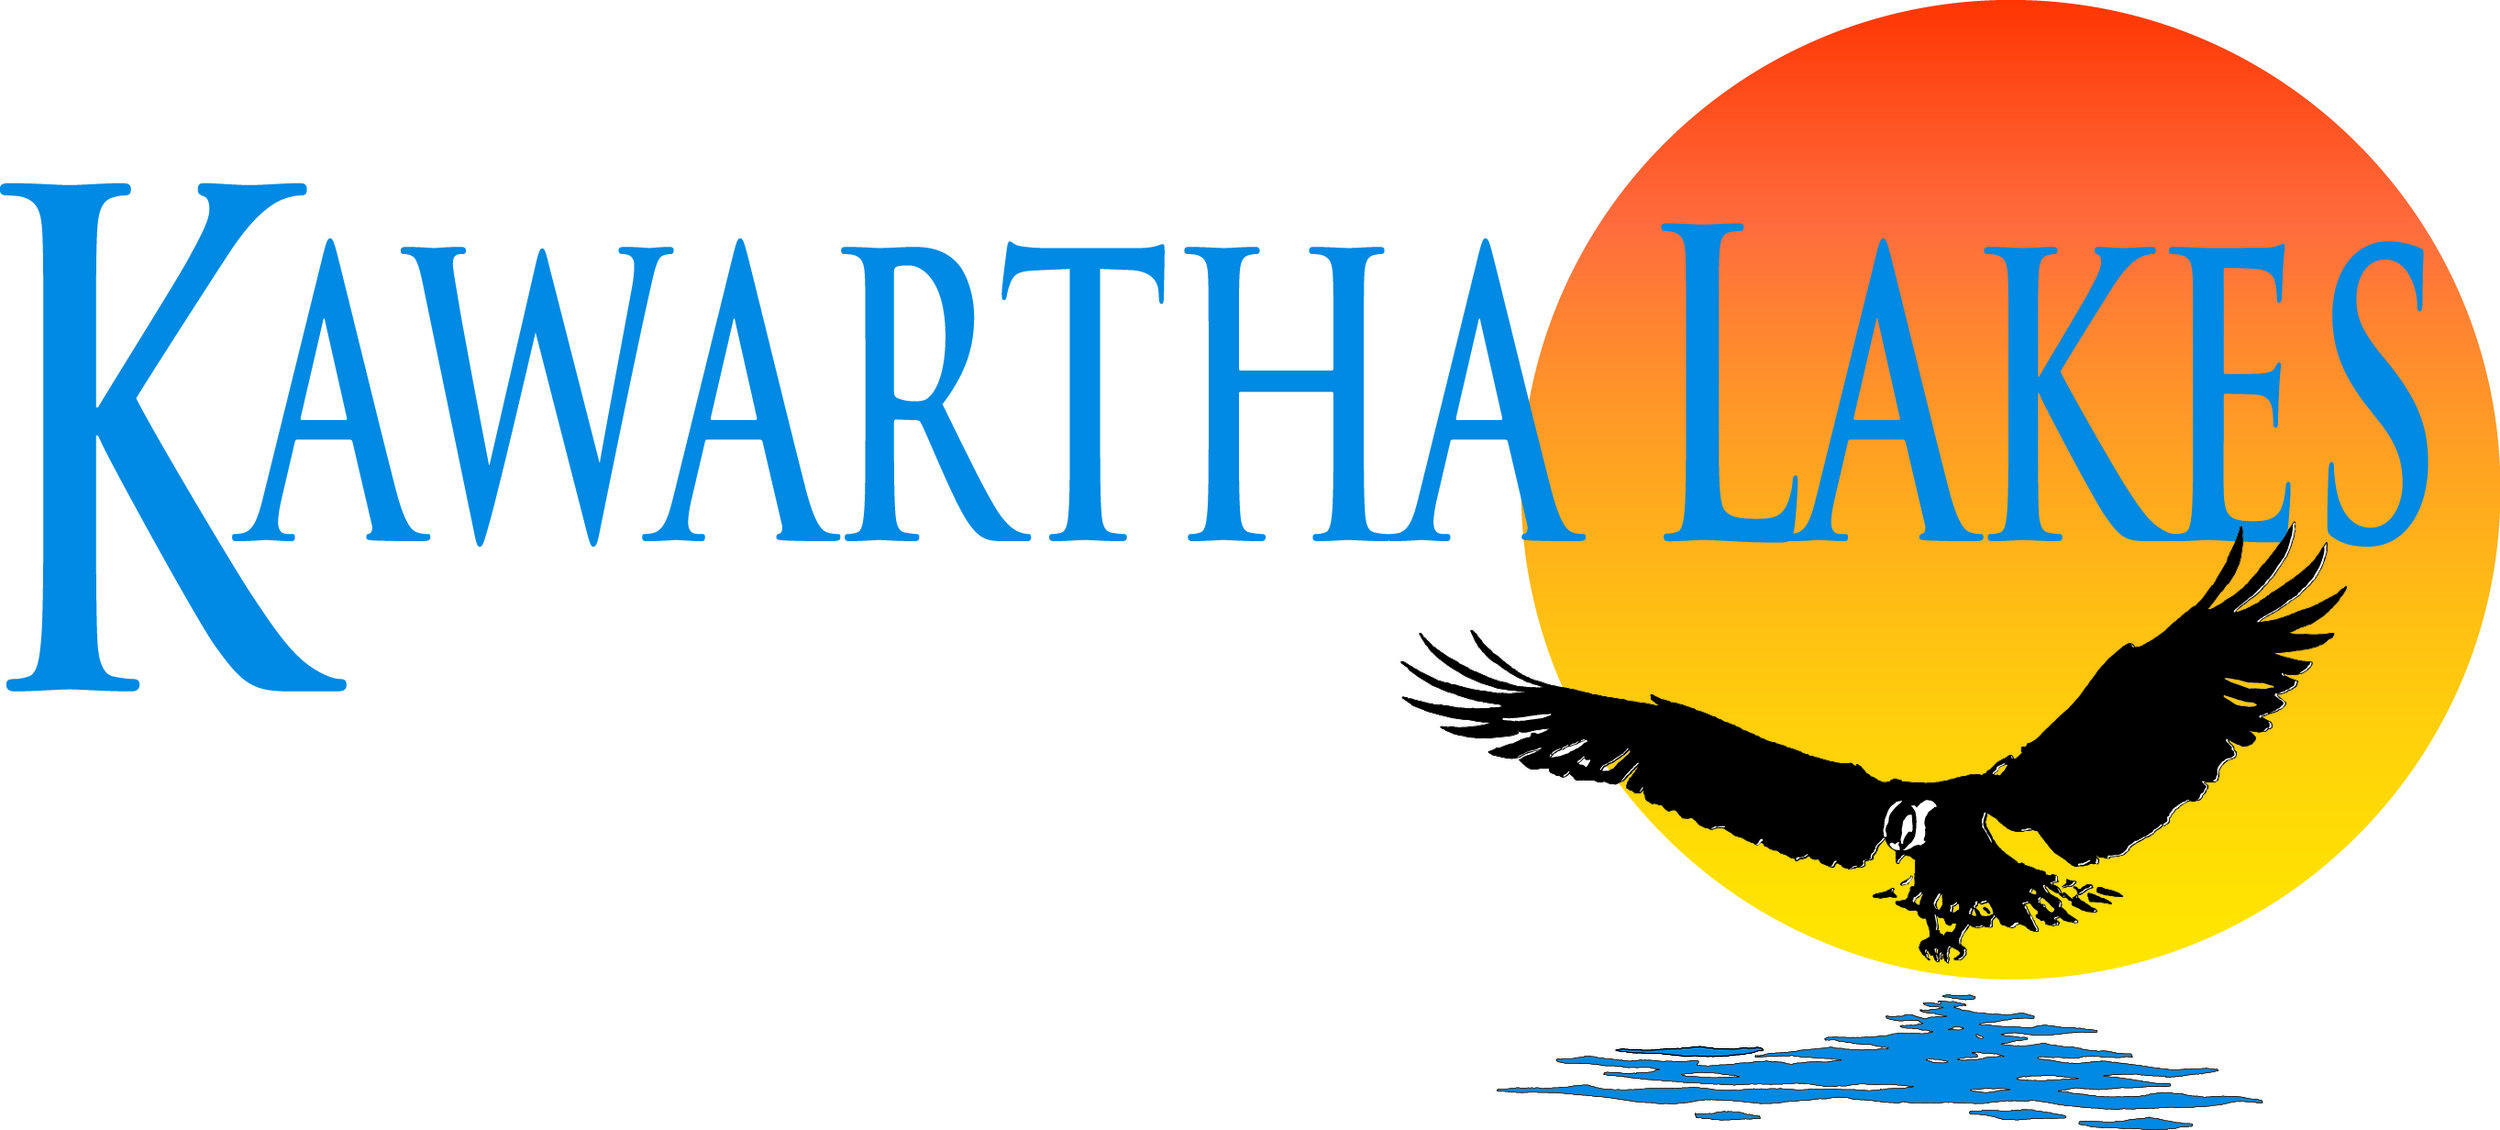 Print - Kawartha Lakes-logo-Standard-CMYK.jpeg.jpg